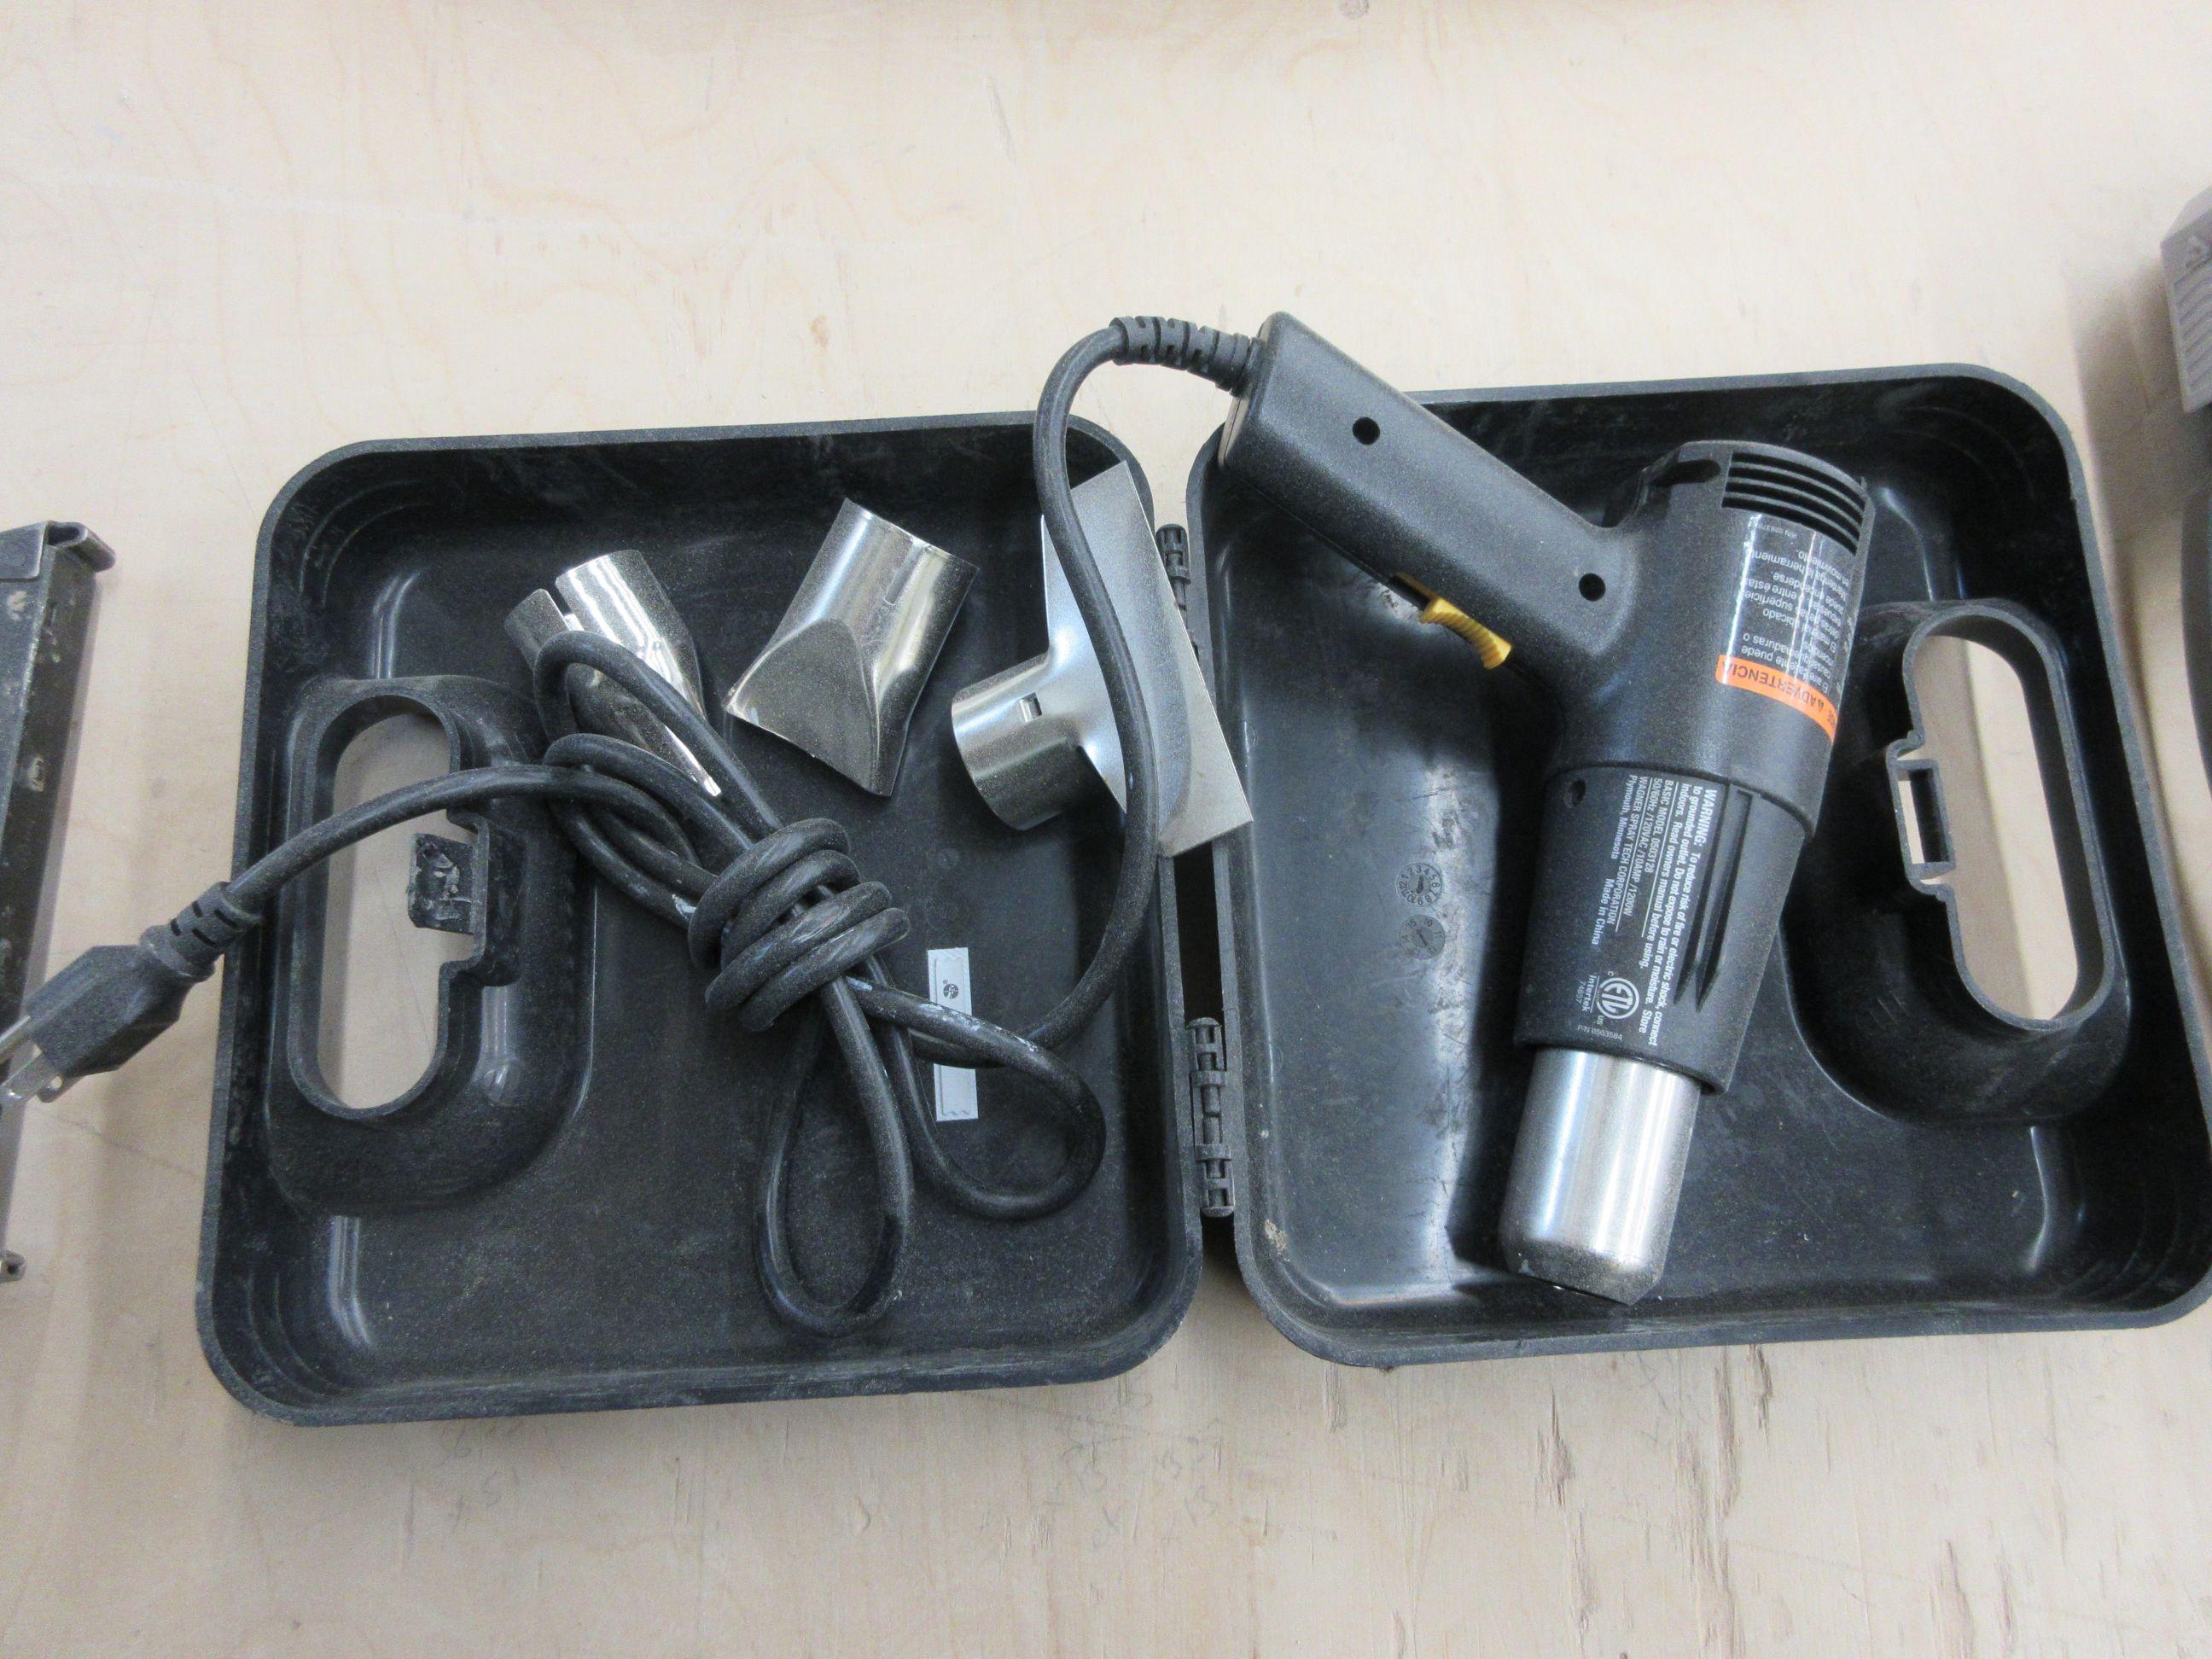 LOT including heater, stapler, etc. - Image 3 of 4